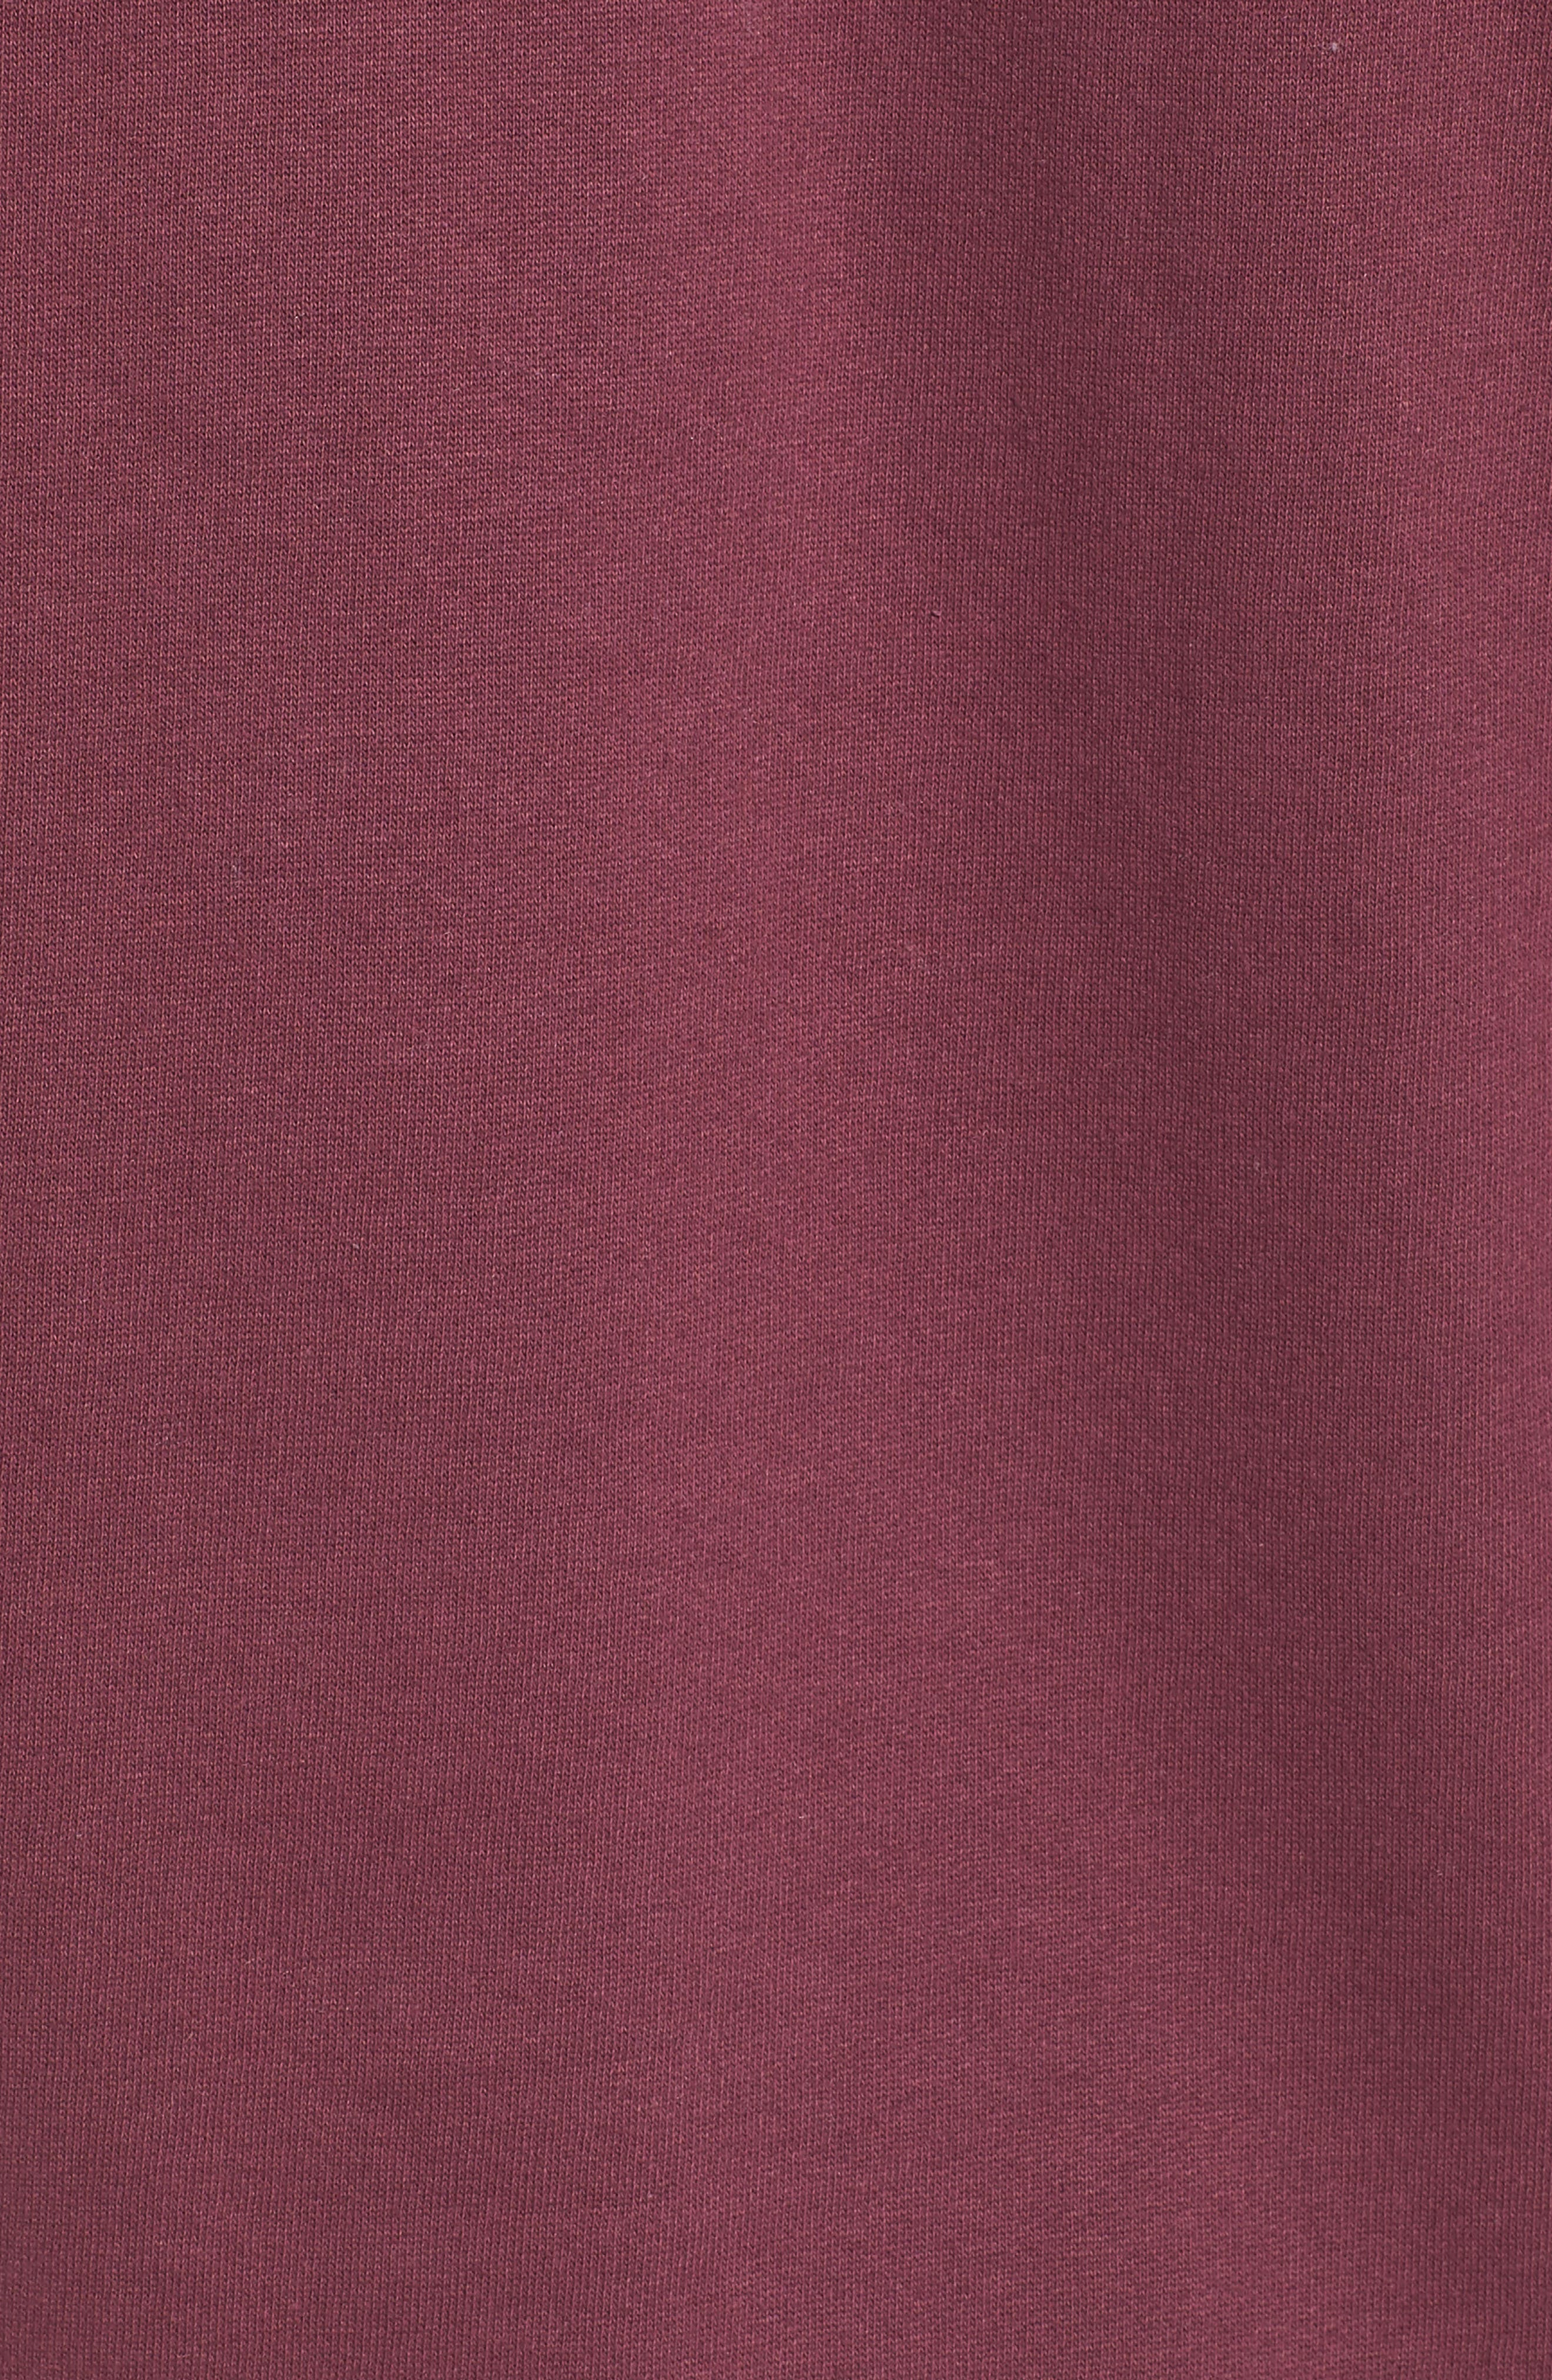 Alternate Image 5  - Obey Ennet Hooded Pullover